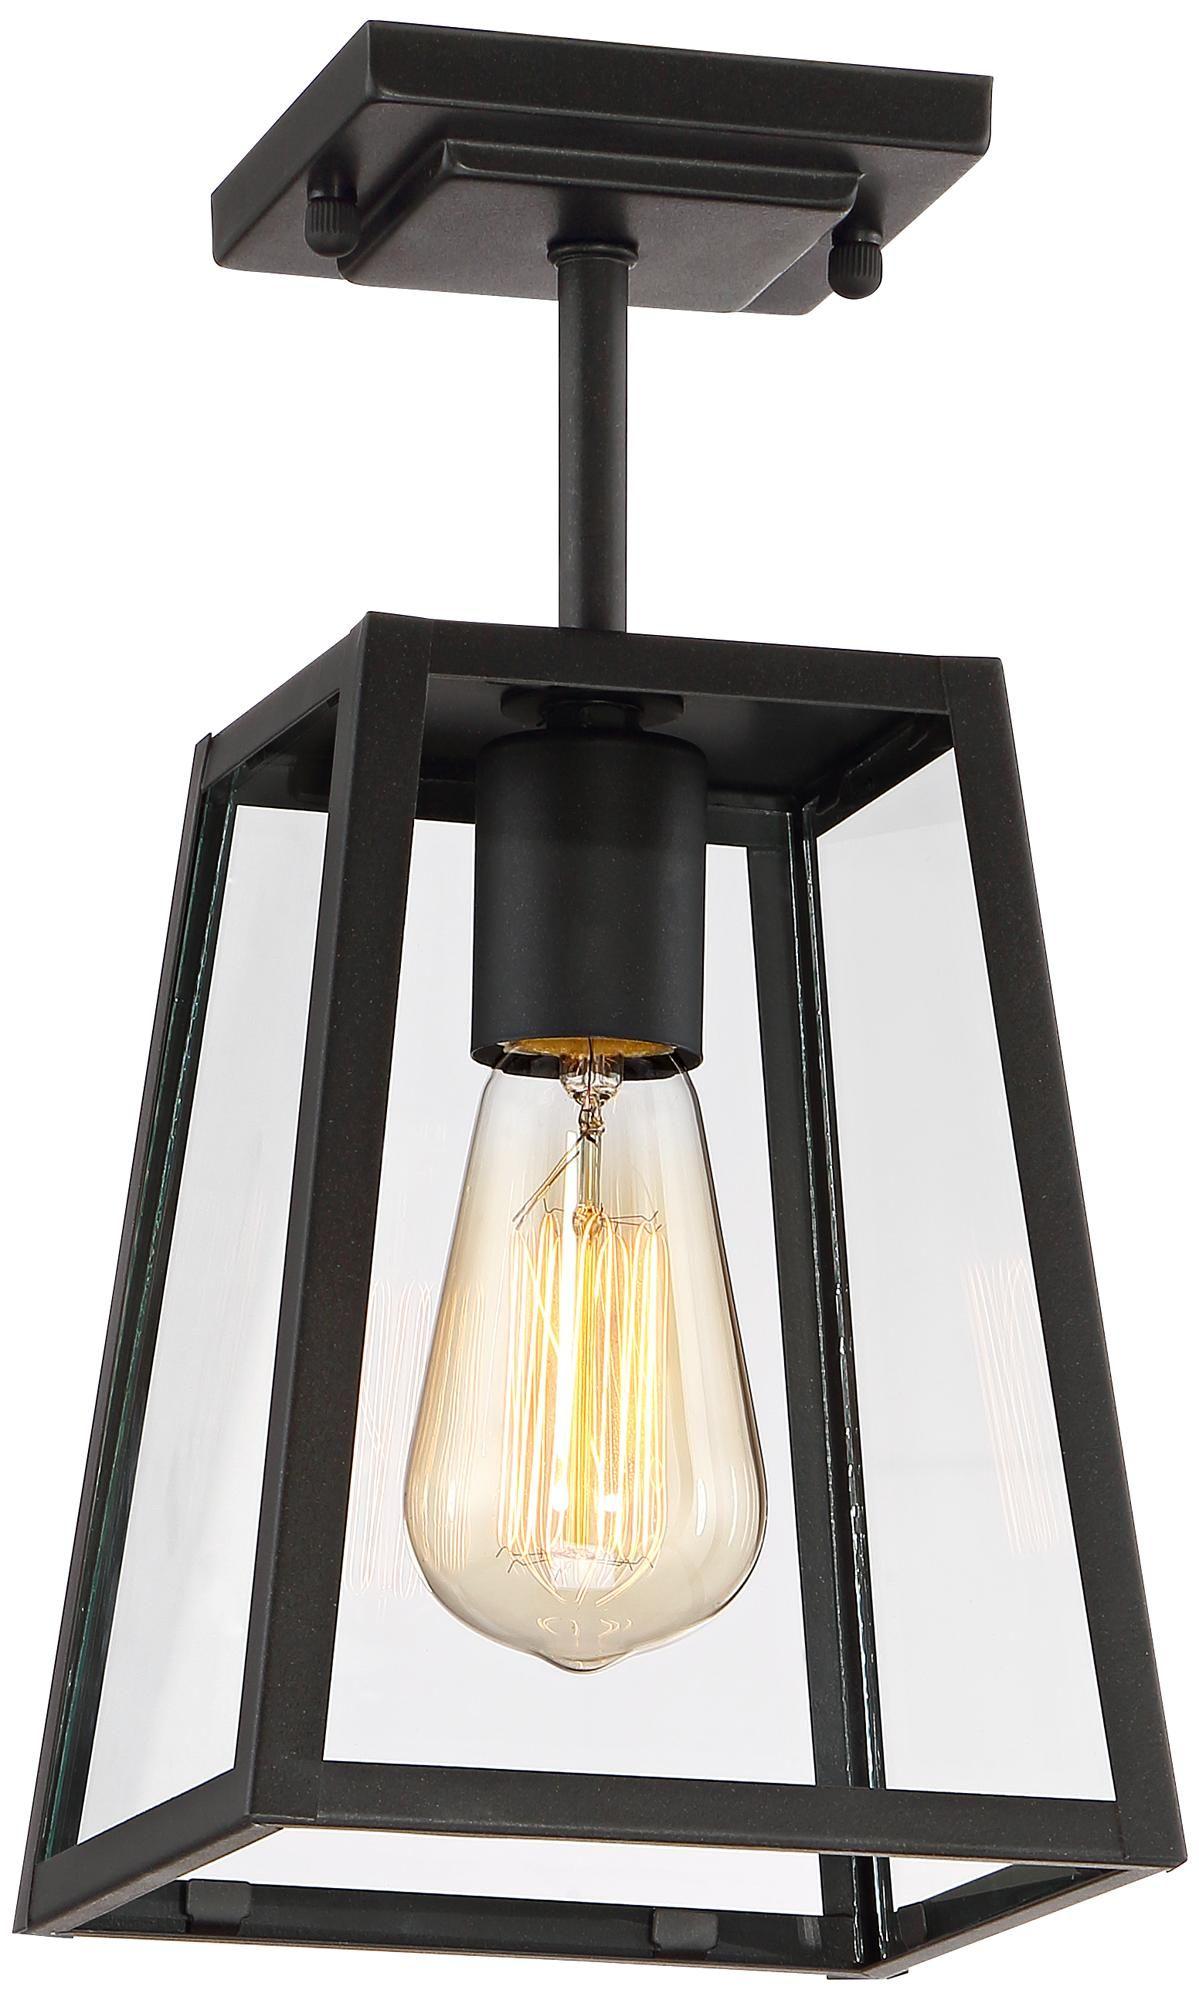 Arrington 6 Wide Mystic Black Outdoor Ceiling Light 1n481 Lamps Plus In 2021 Ceiling Lights Outdoor Ceiling Lights Modern Outdoor Ceiling Light